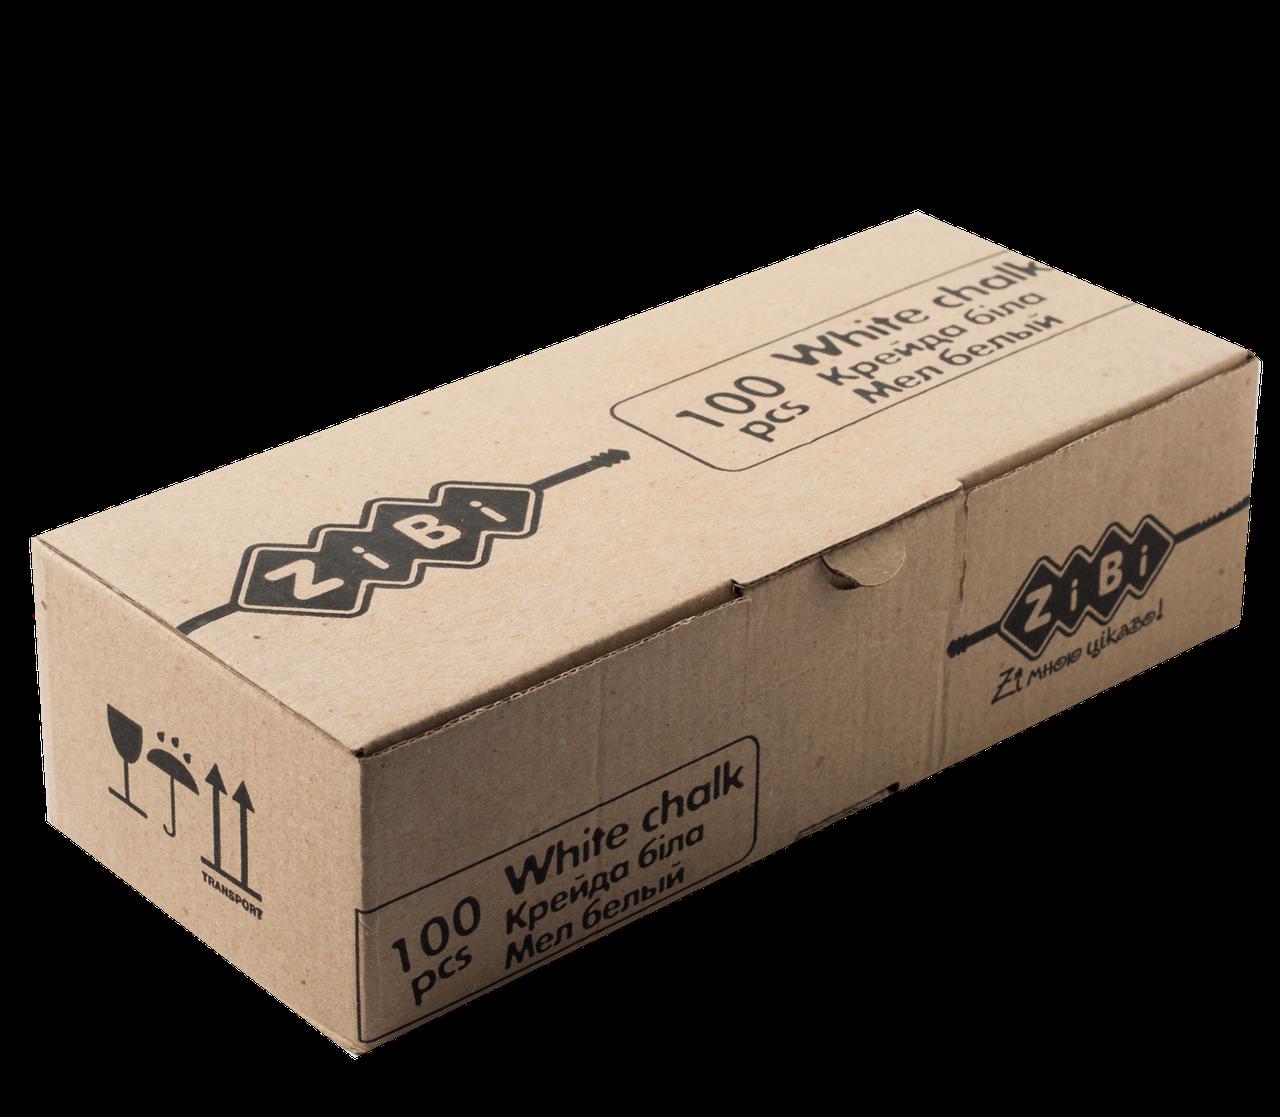 Мел белый квадратный школьный, 100 шт., KIDS Line  ZB.6712-12